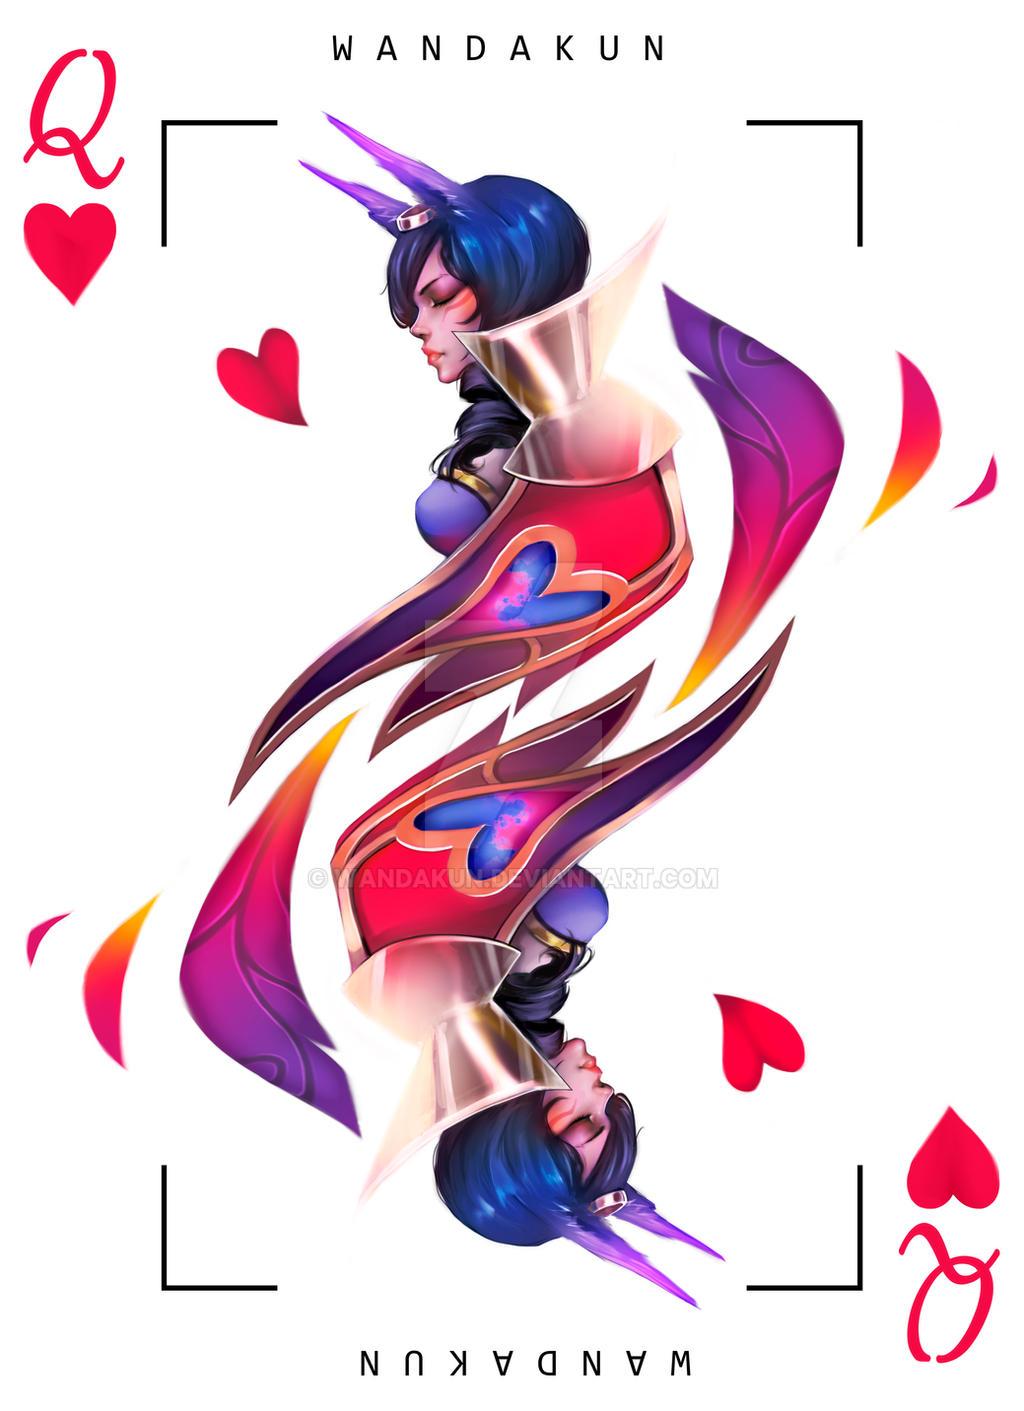 Xayah Character Design : Queen of hearts xayah by wandakun on deviantart